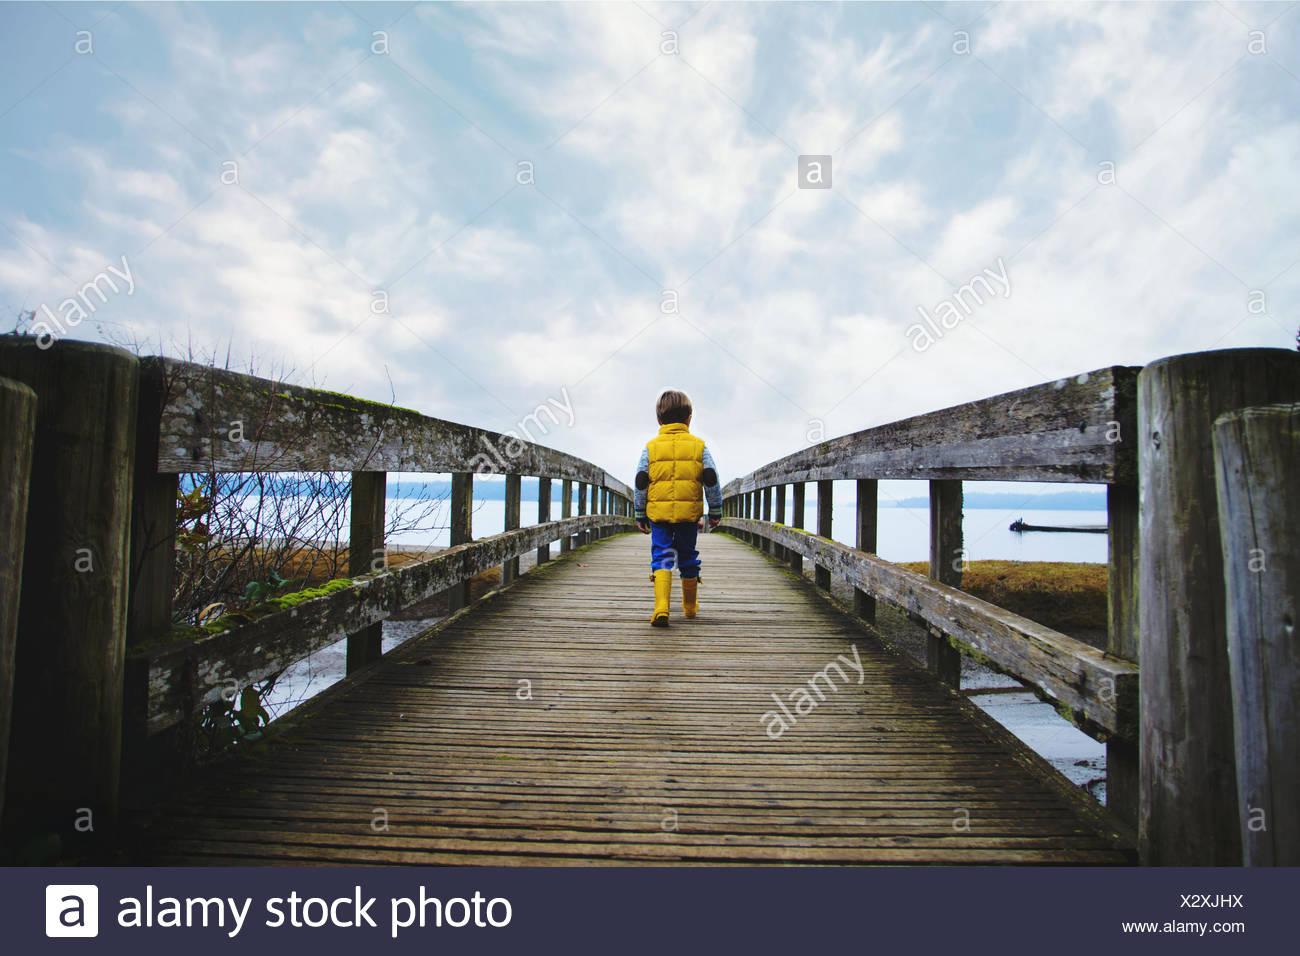 Boy (4-5) walking across wooden bridge - Stock Image